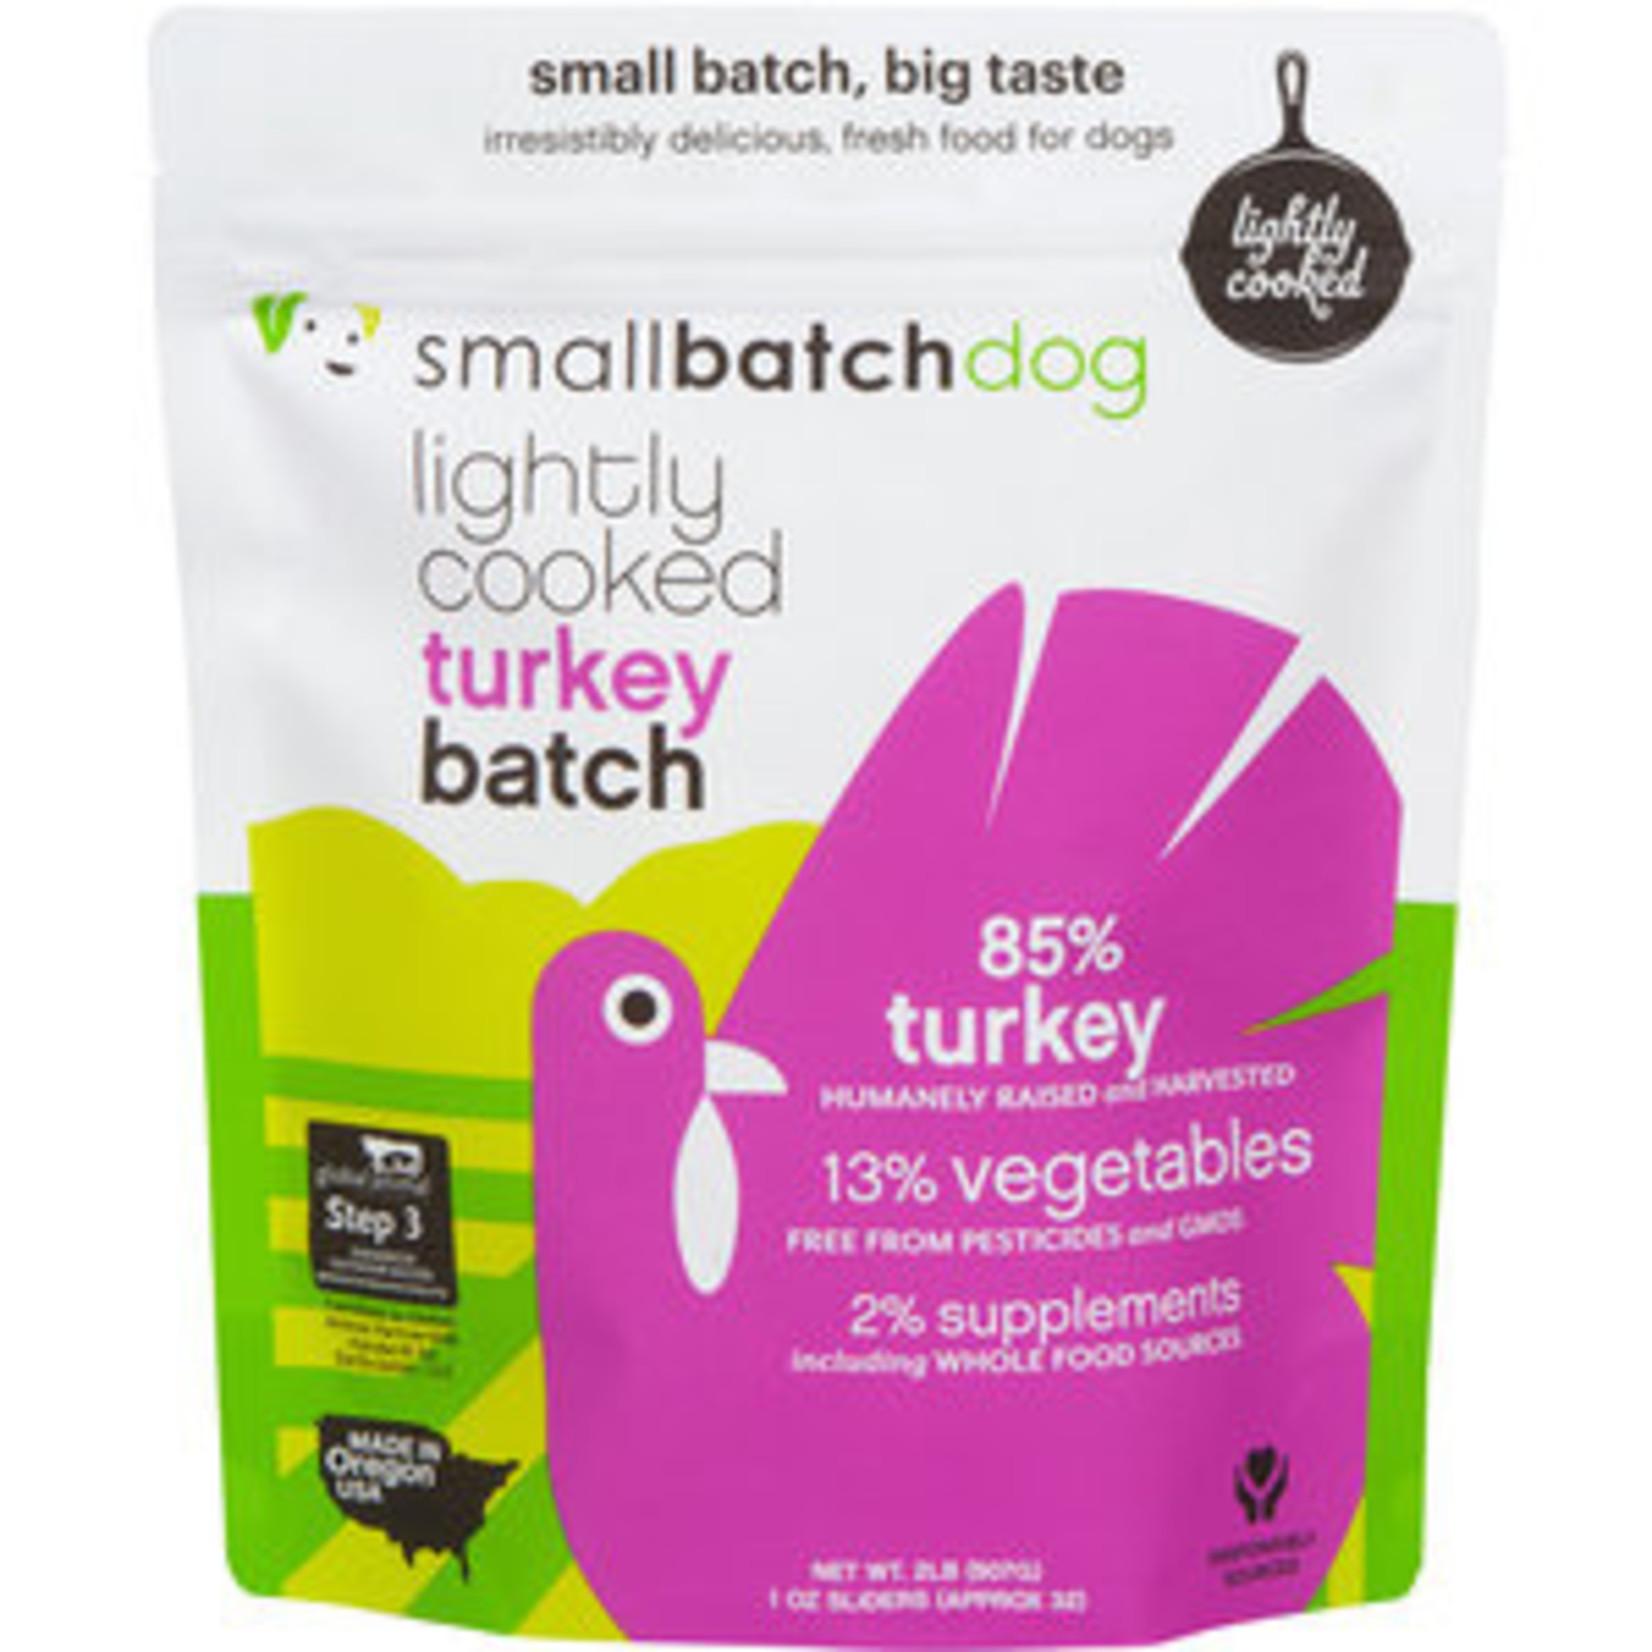 Small Batch Small Batch Frozen Lightly Cooked TurkeyBatch Dog Food